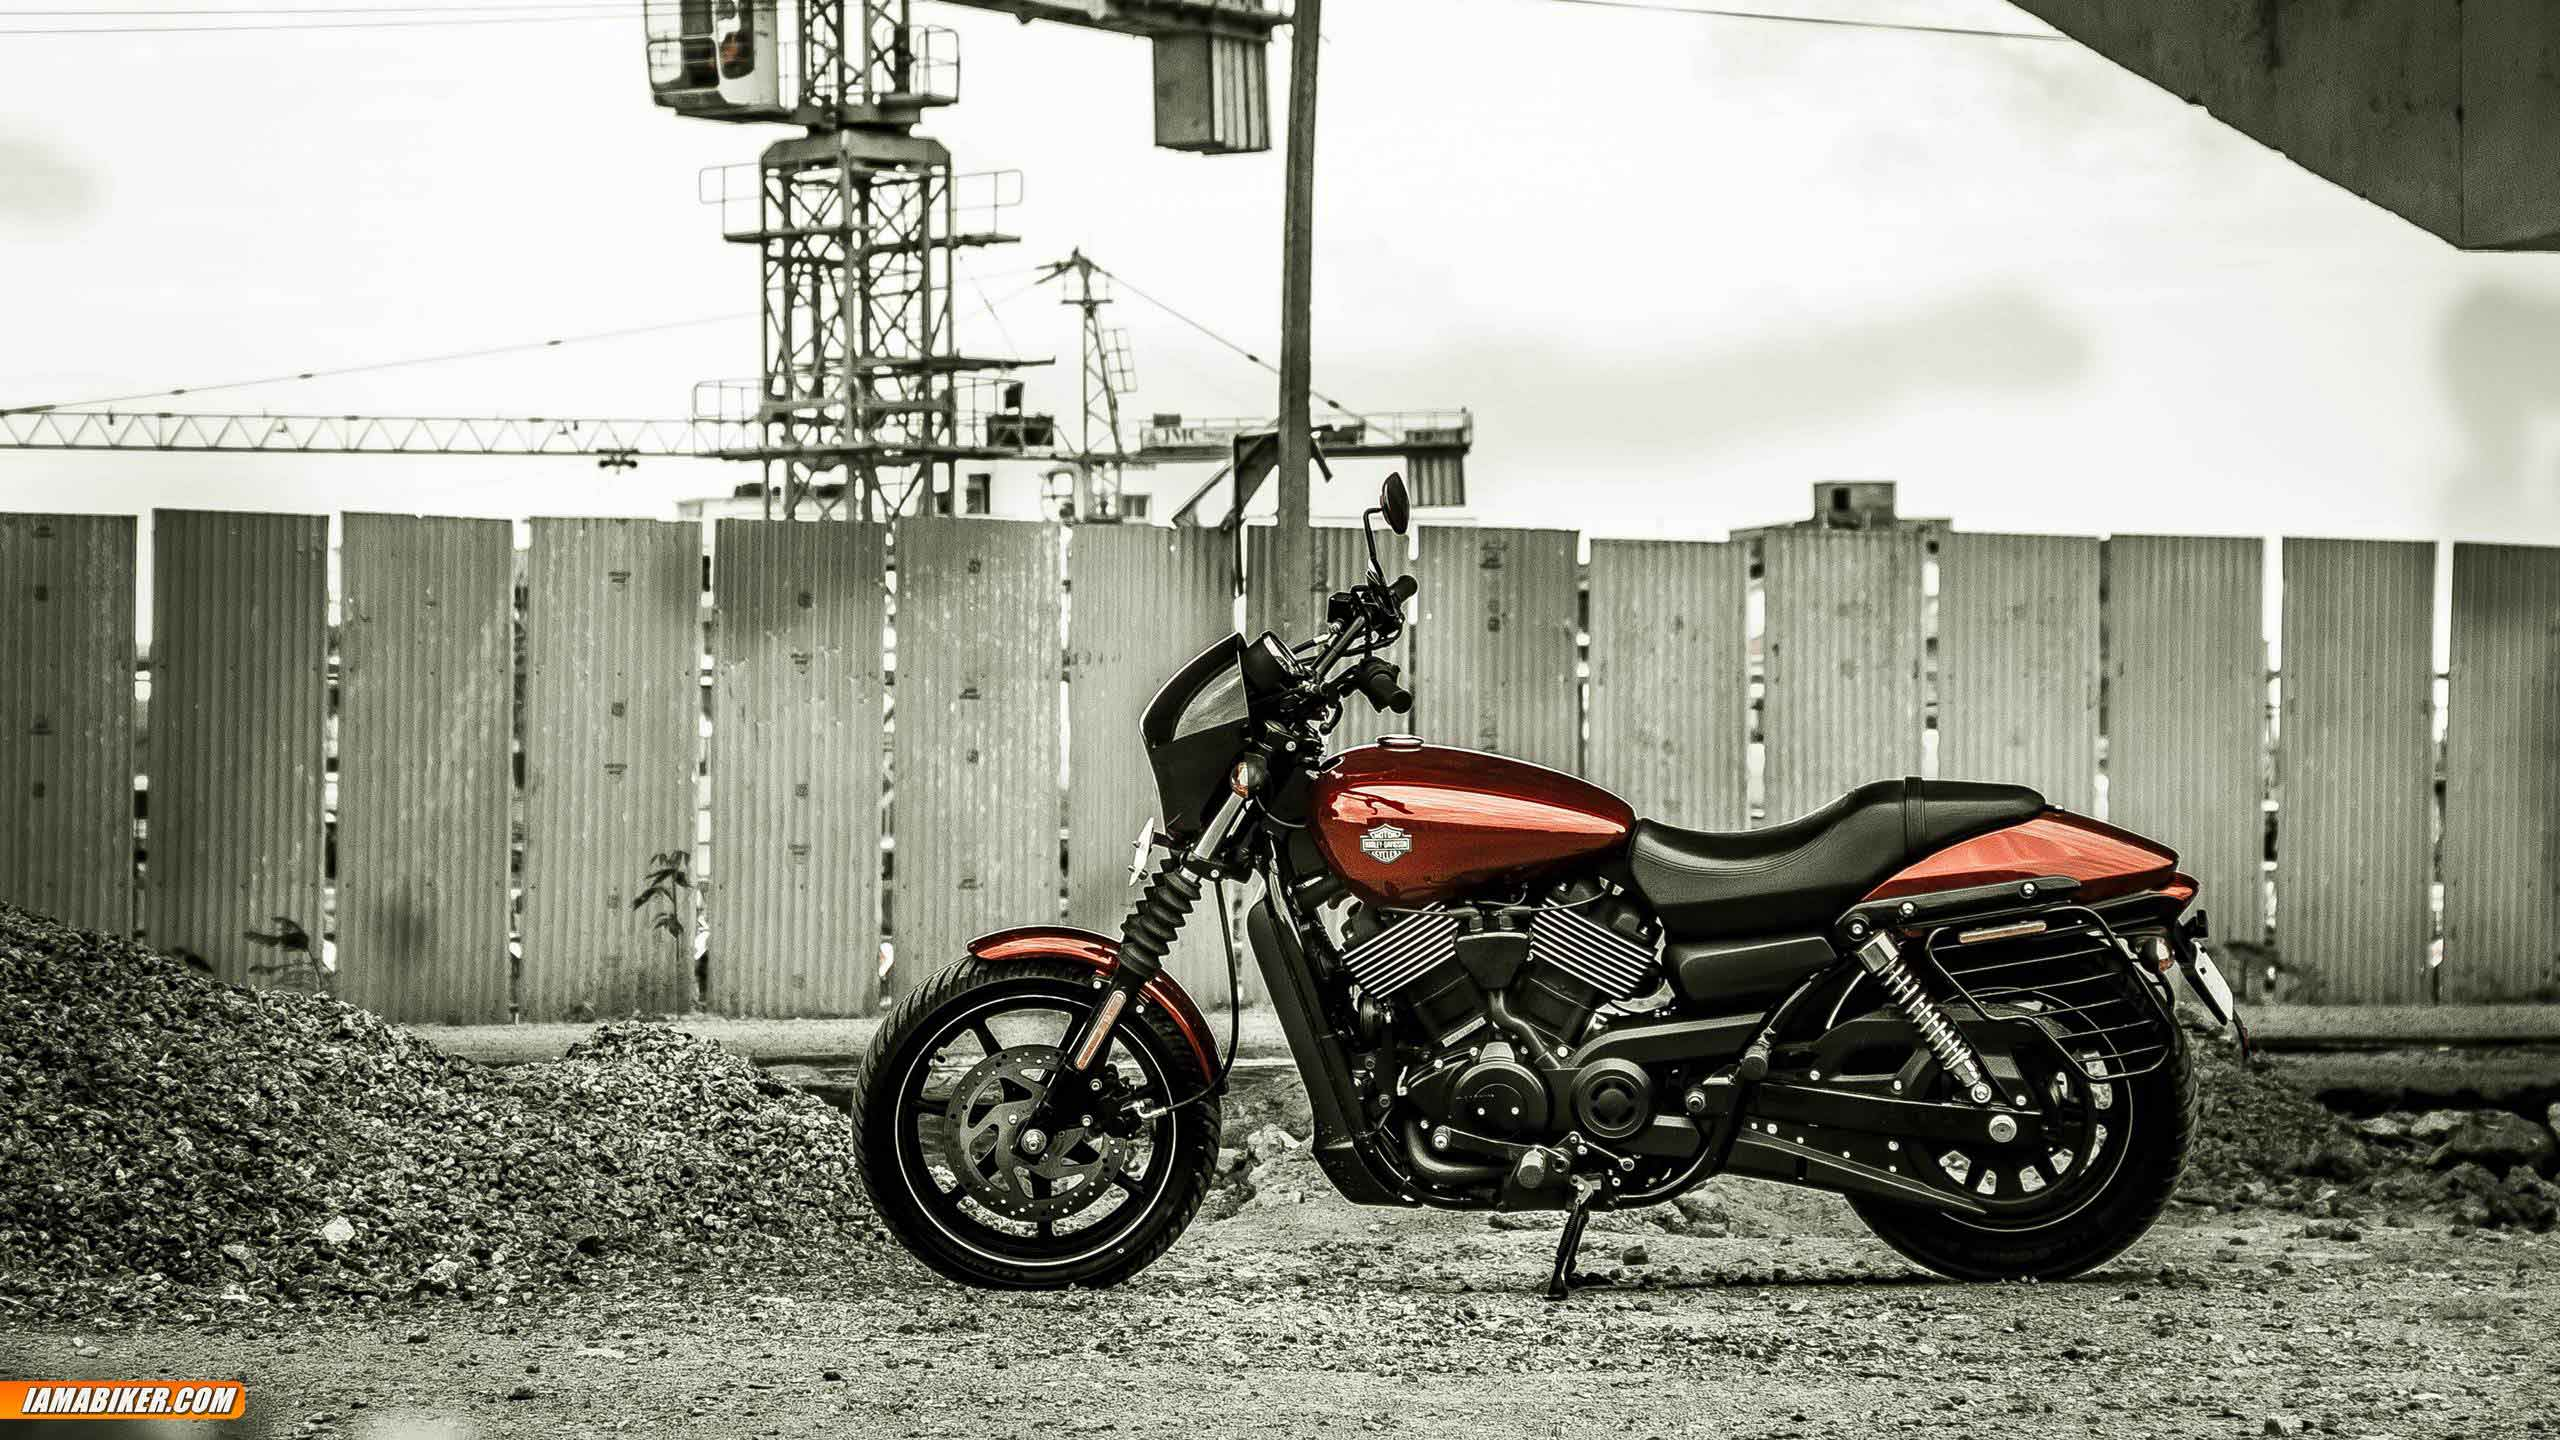 Harley Davidson Street 750 HD wallpapers